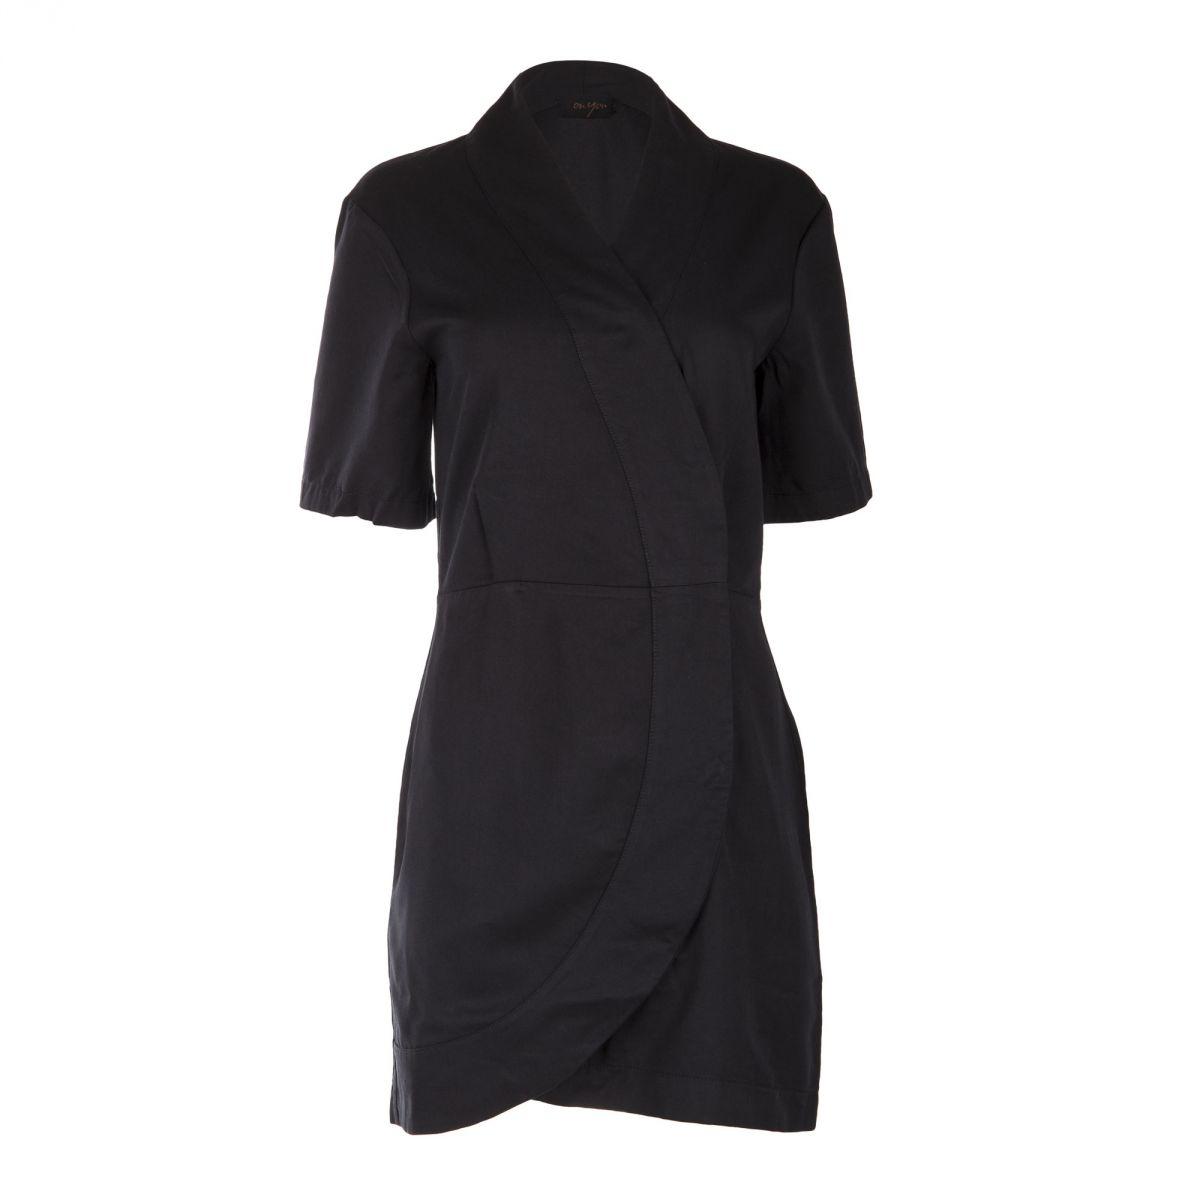 robe noire portefeuille manches courtes femme on you prix. Black Bedroom Furniture Sets. Home Design Ideas